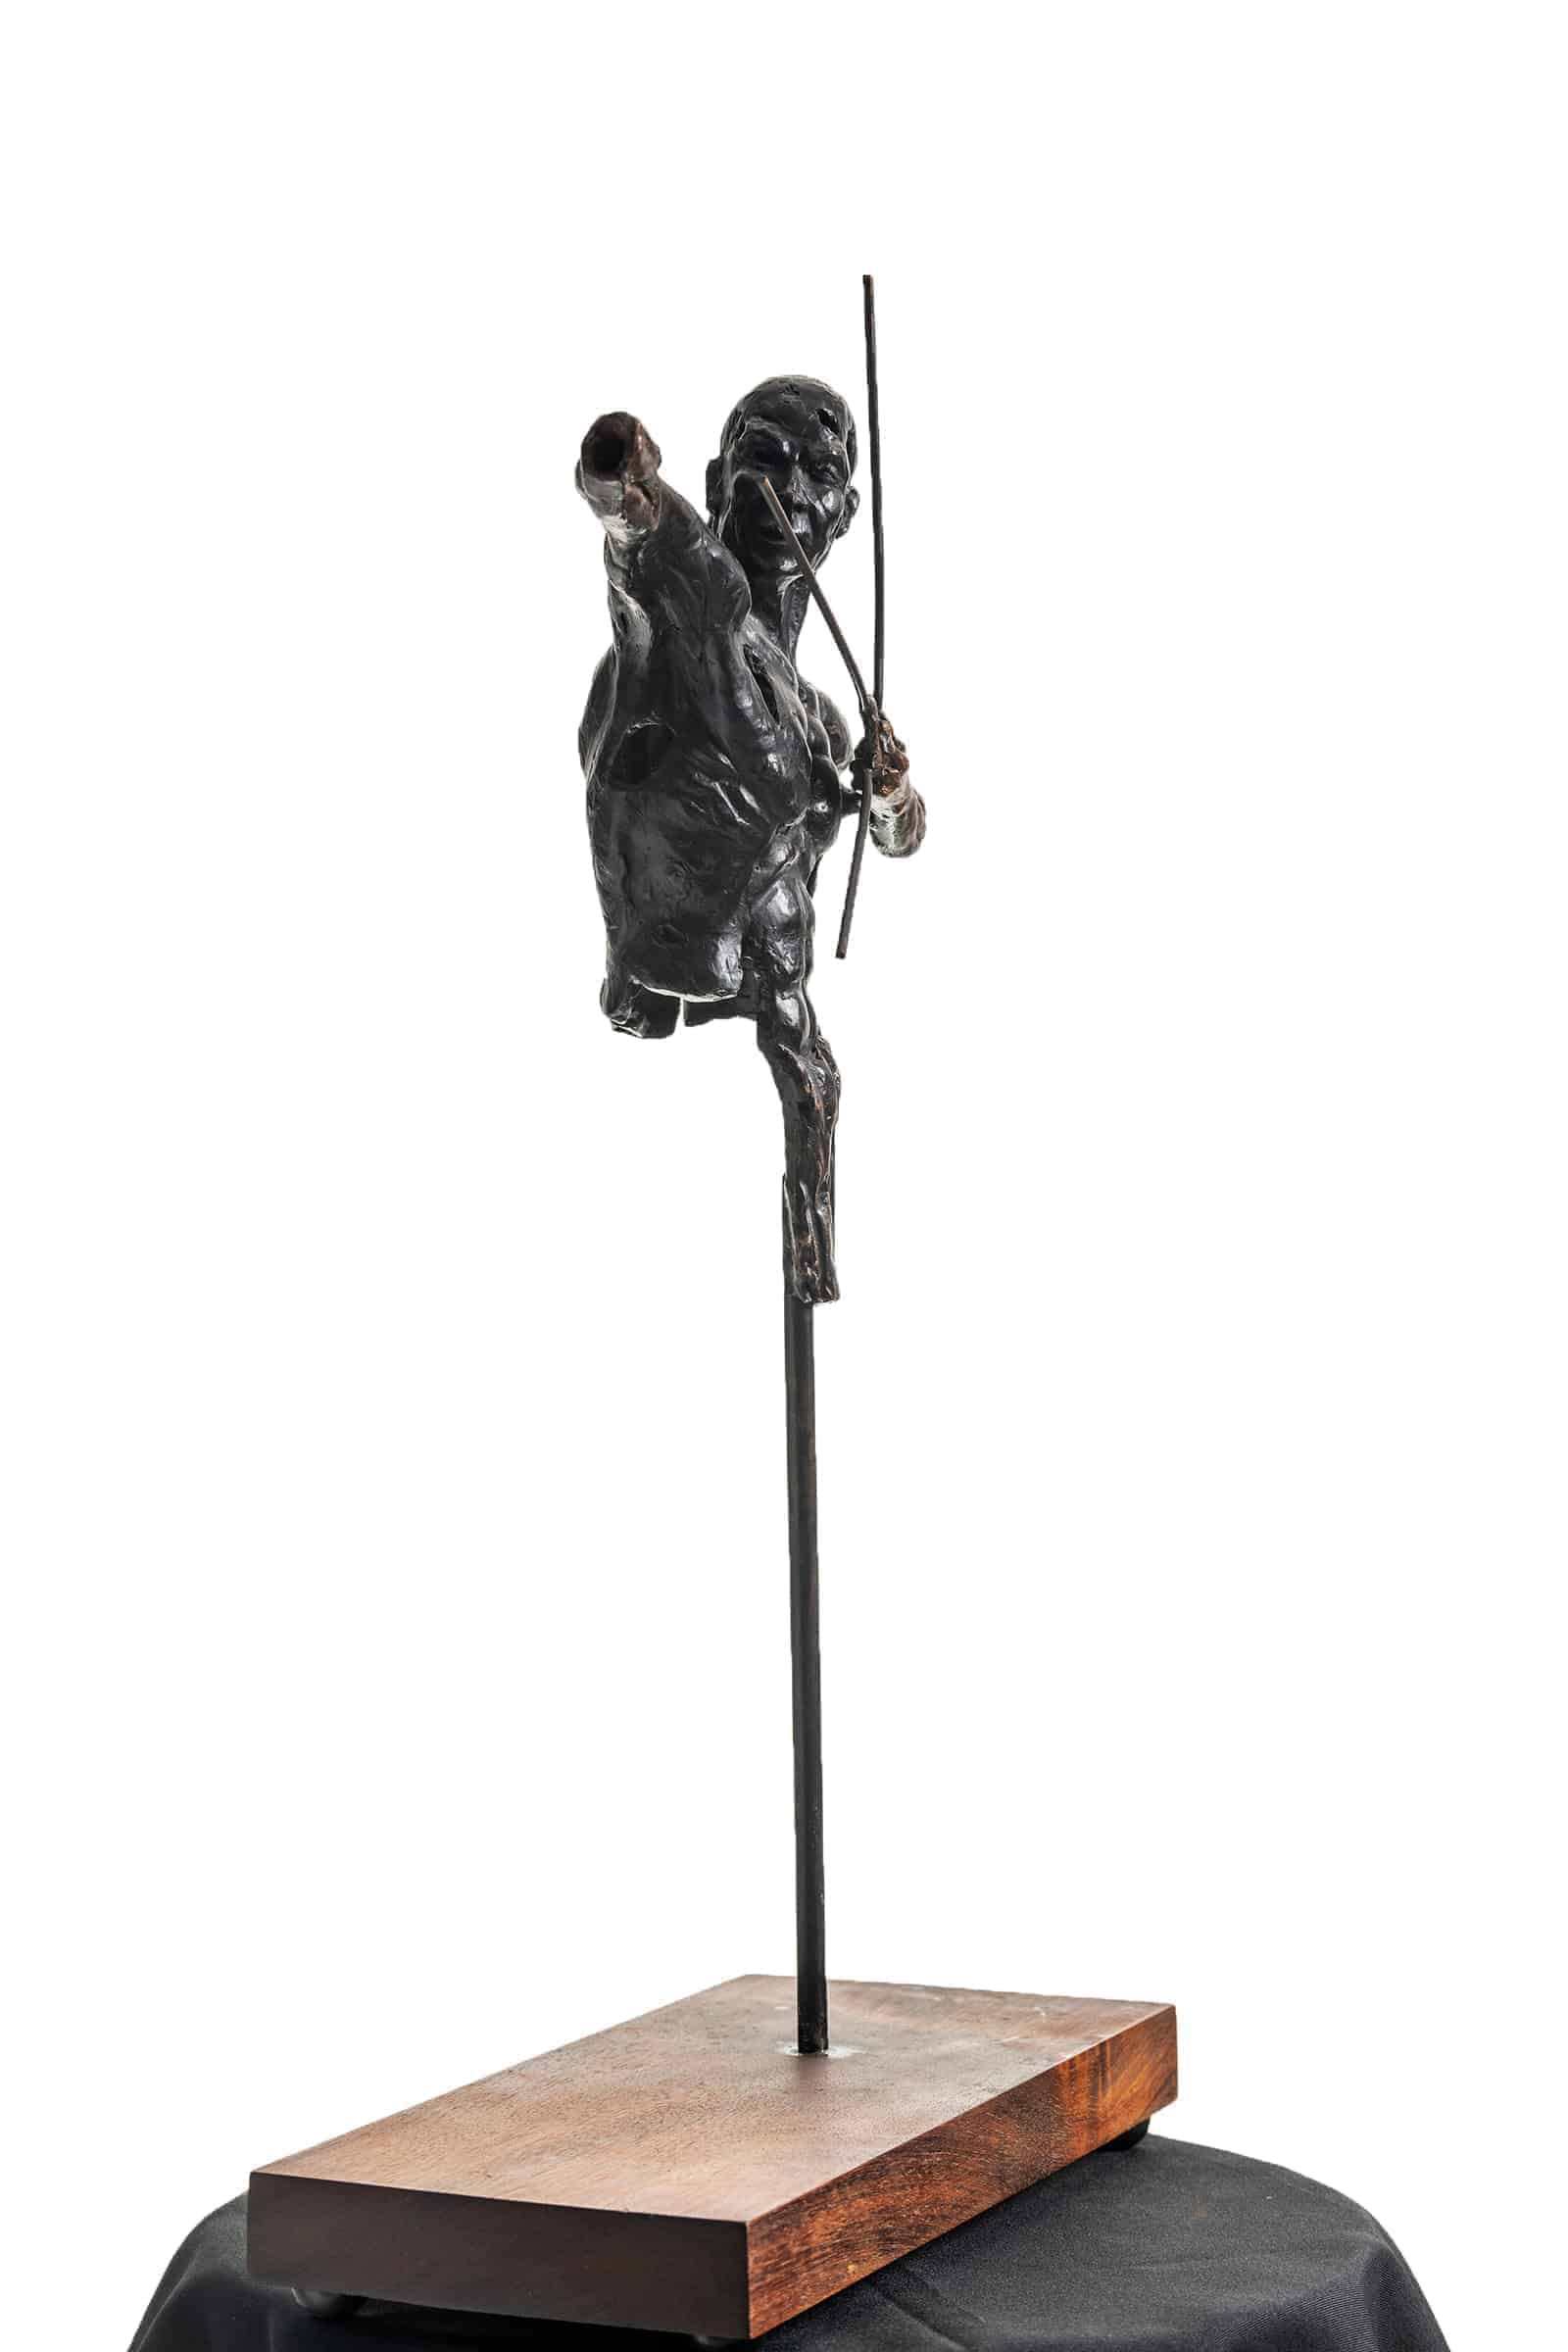 Edgar Castrejón – Cupido